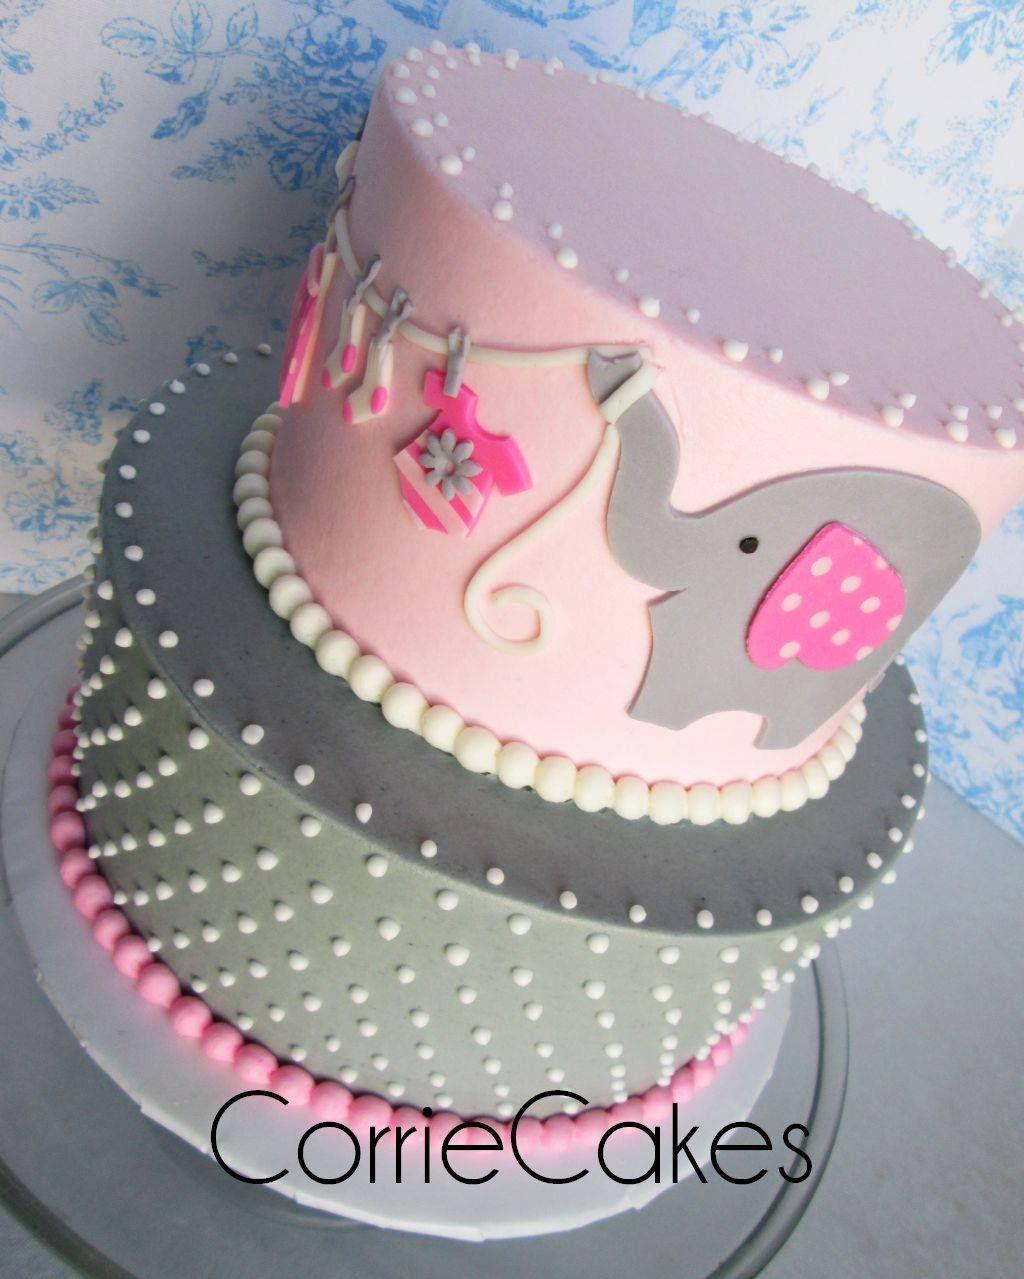 Pasteles Para Baby Shower Niño Elefante : pasteles, shower, niño, elefante, Shower:, CorrieCakes,, Facebook, Tortas, Elefantes,, Pastel, Elefante,, Pasteles, Shower, Niña